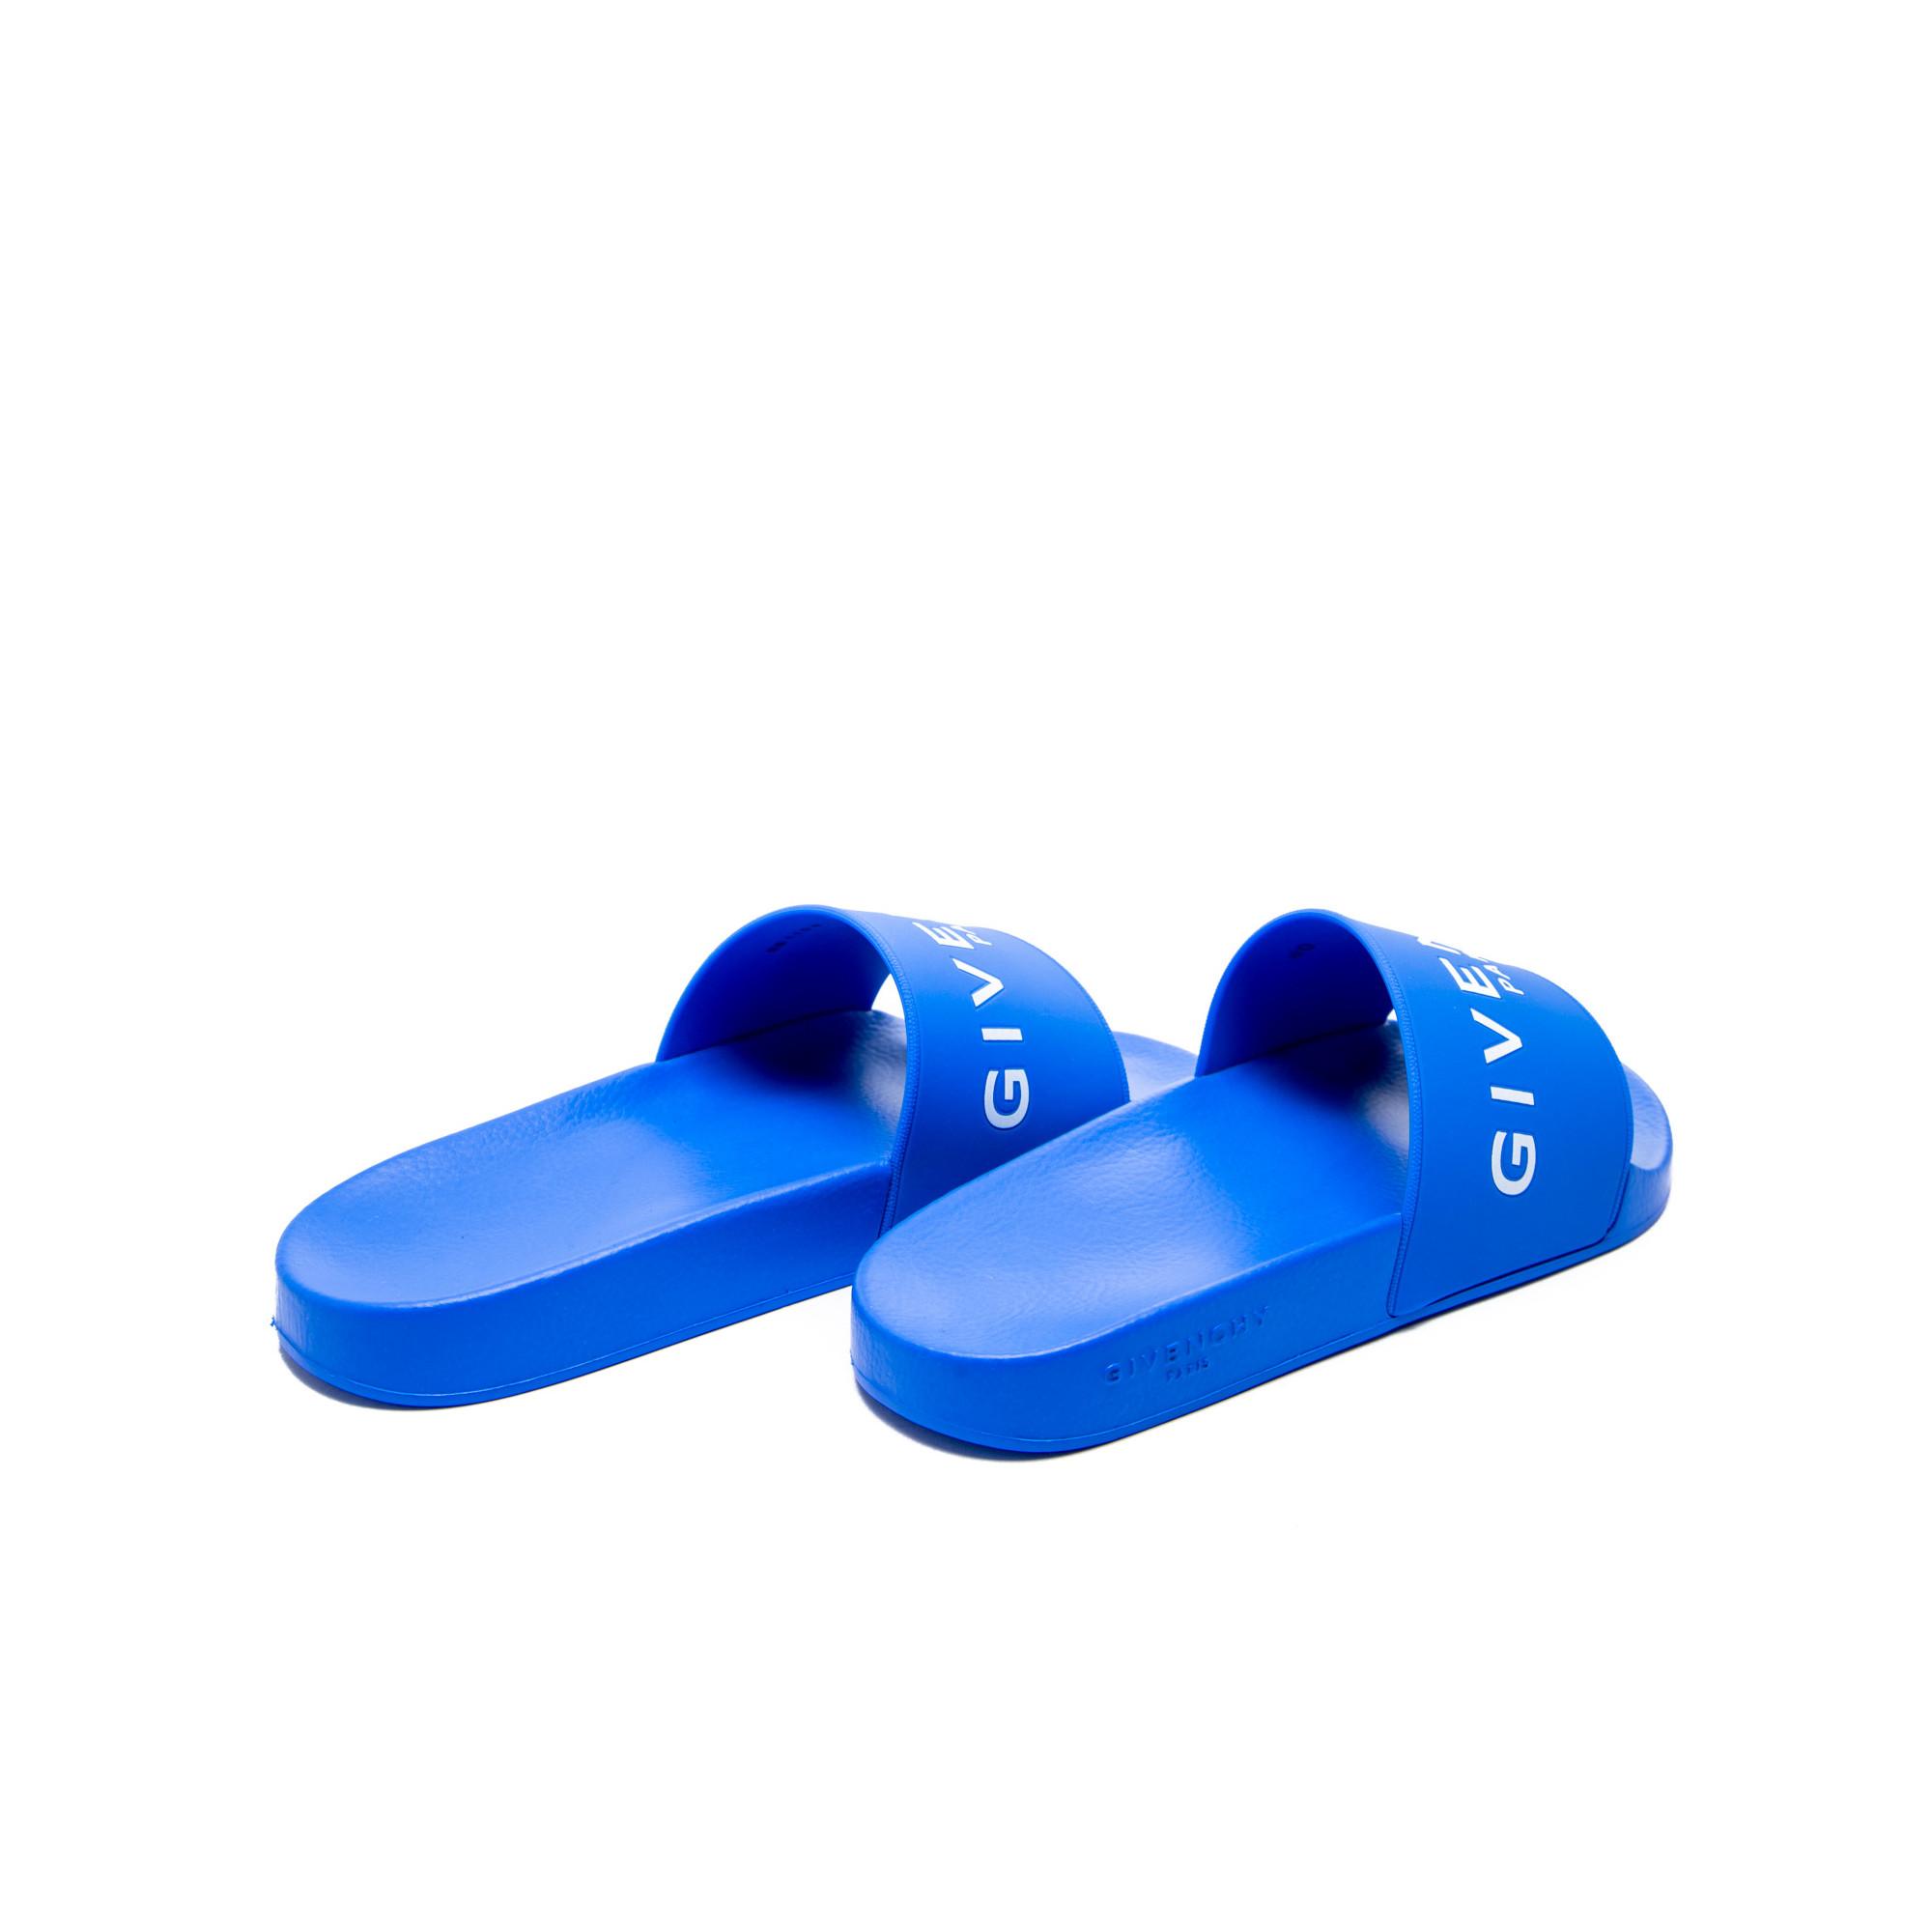 54cbf1e3df75 ... Givenchy slide flat sandals multi ...